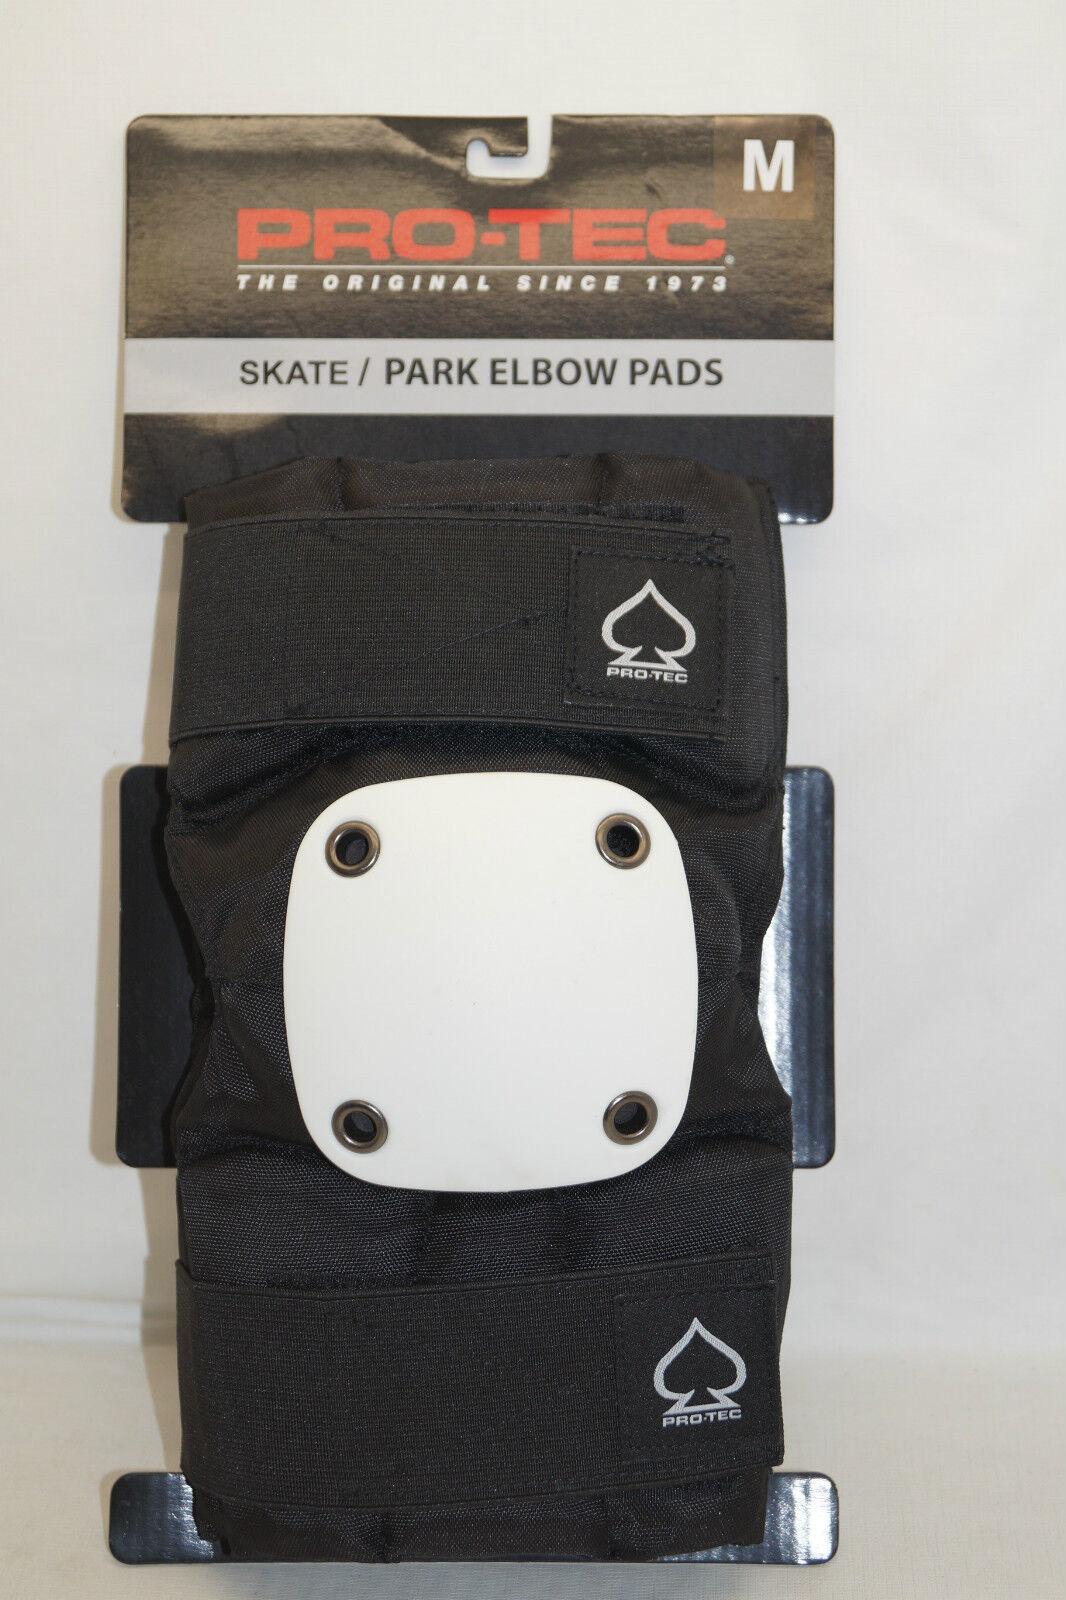 Pro-Tec Skate Park ELBOW PADS gomito saver M Taglia M saver Skateboard Bmx Mountain Bike f0f542